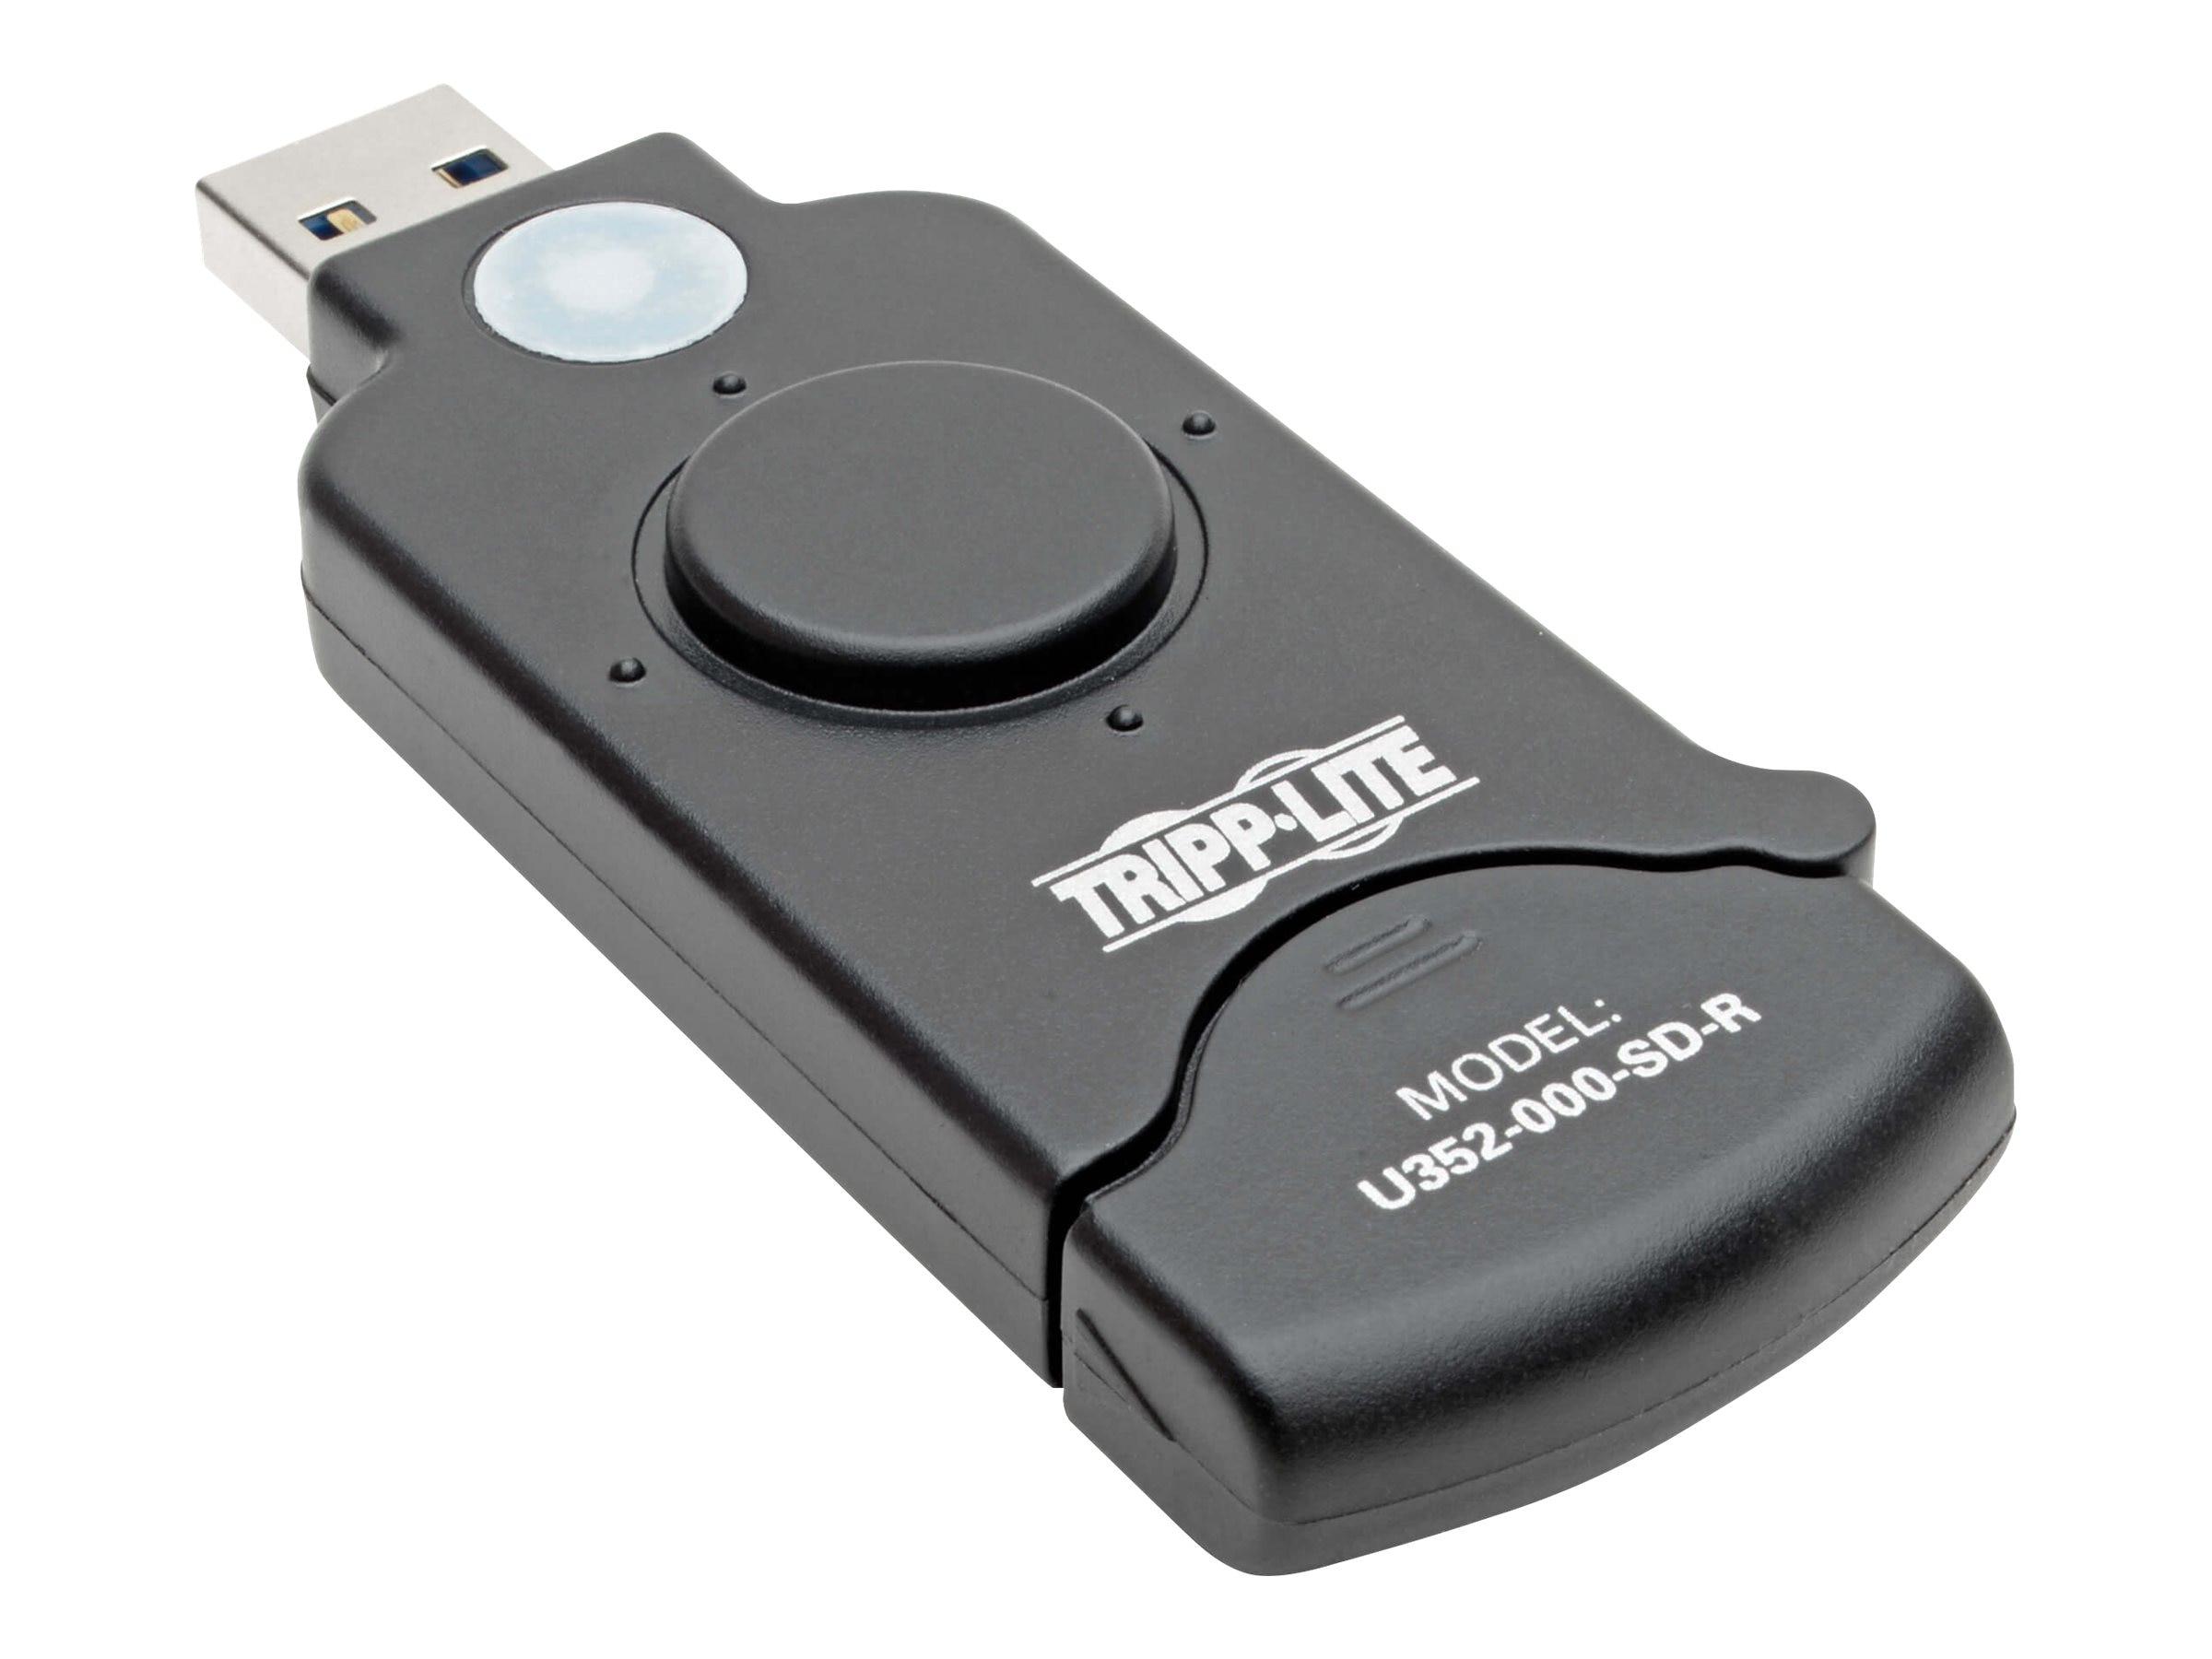 58847add7 Tripp Lite USB 3.0 Super Speed SDXC Card Reader (U352-000-SD-R)